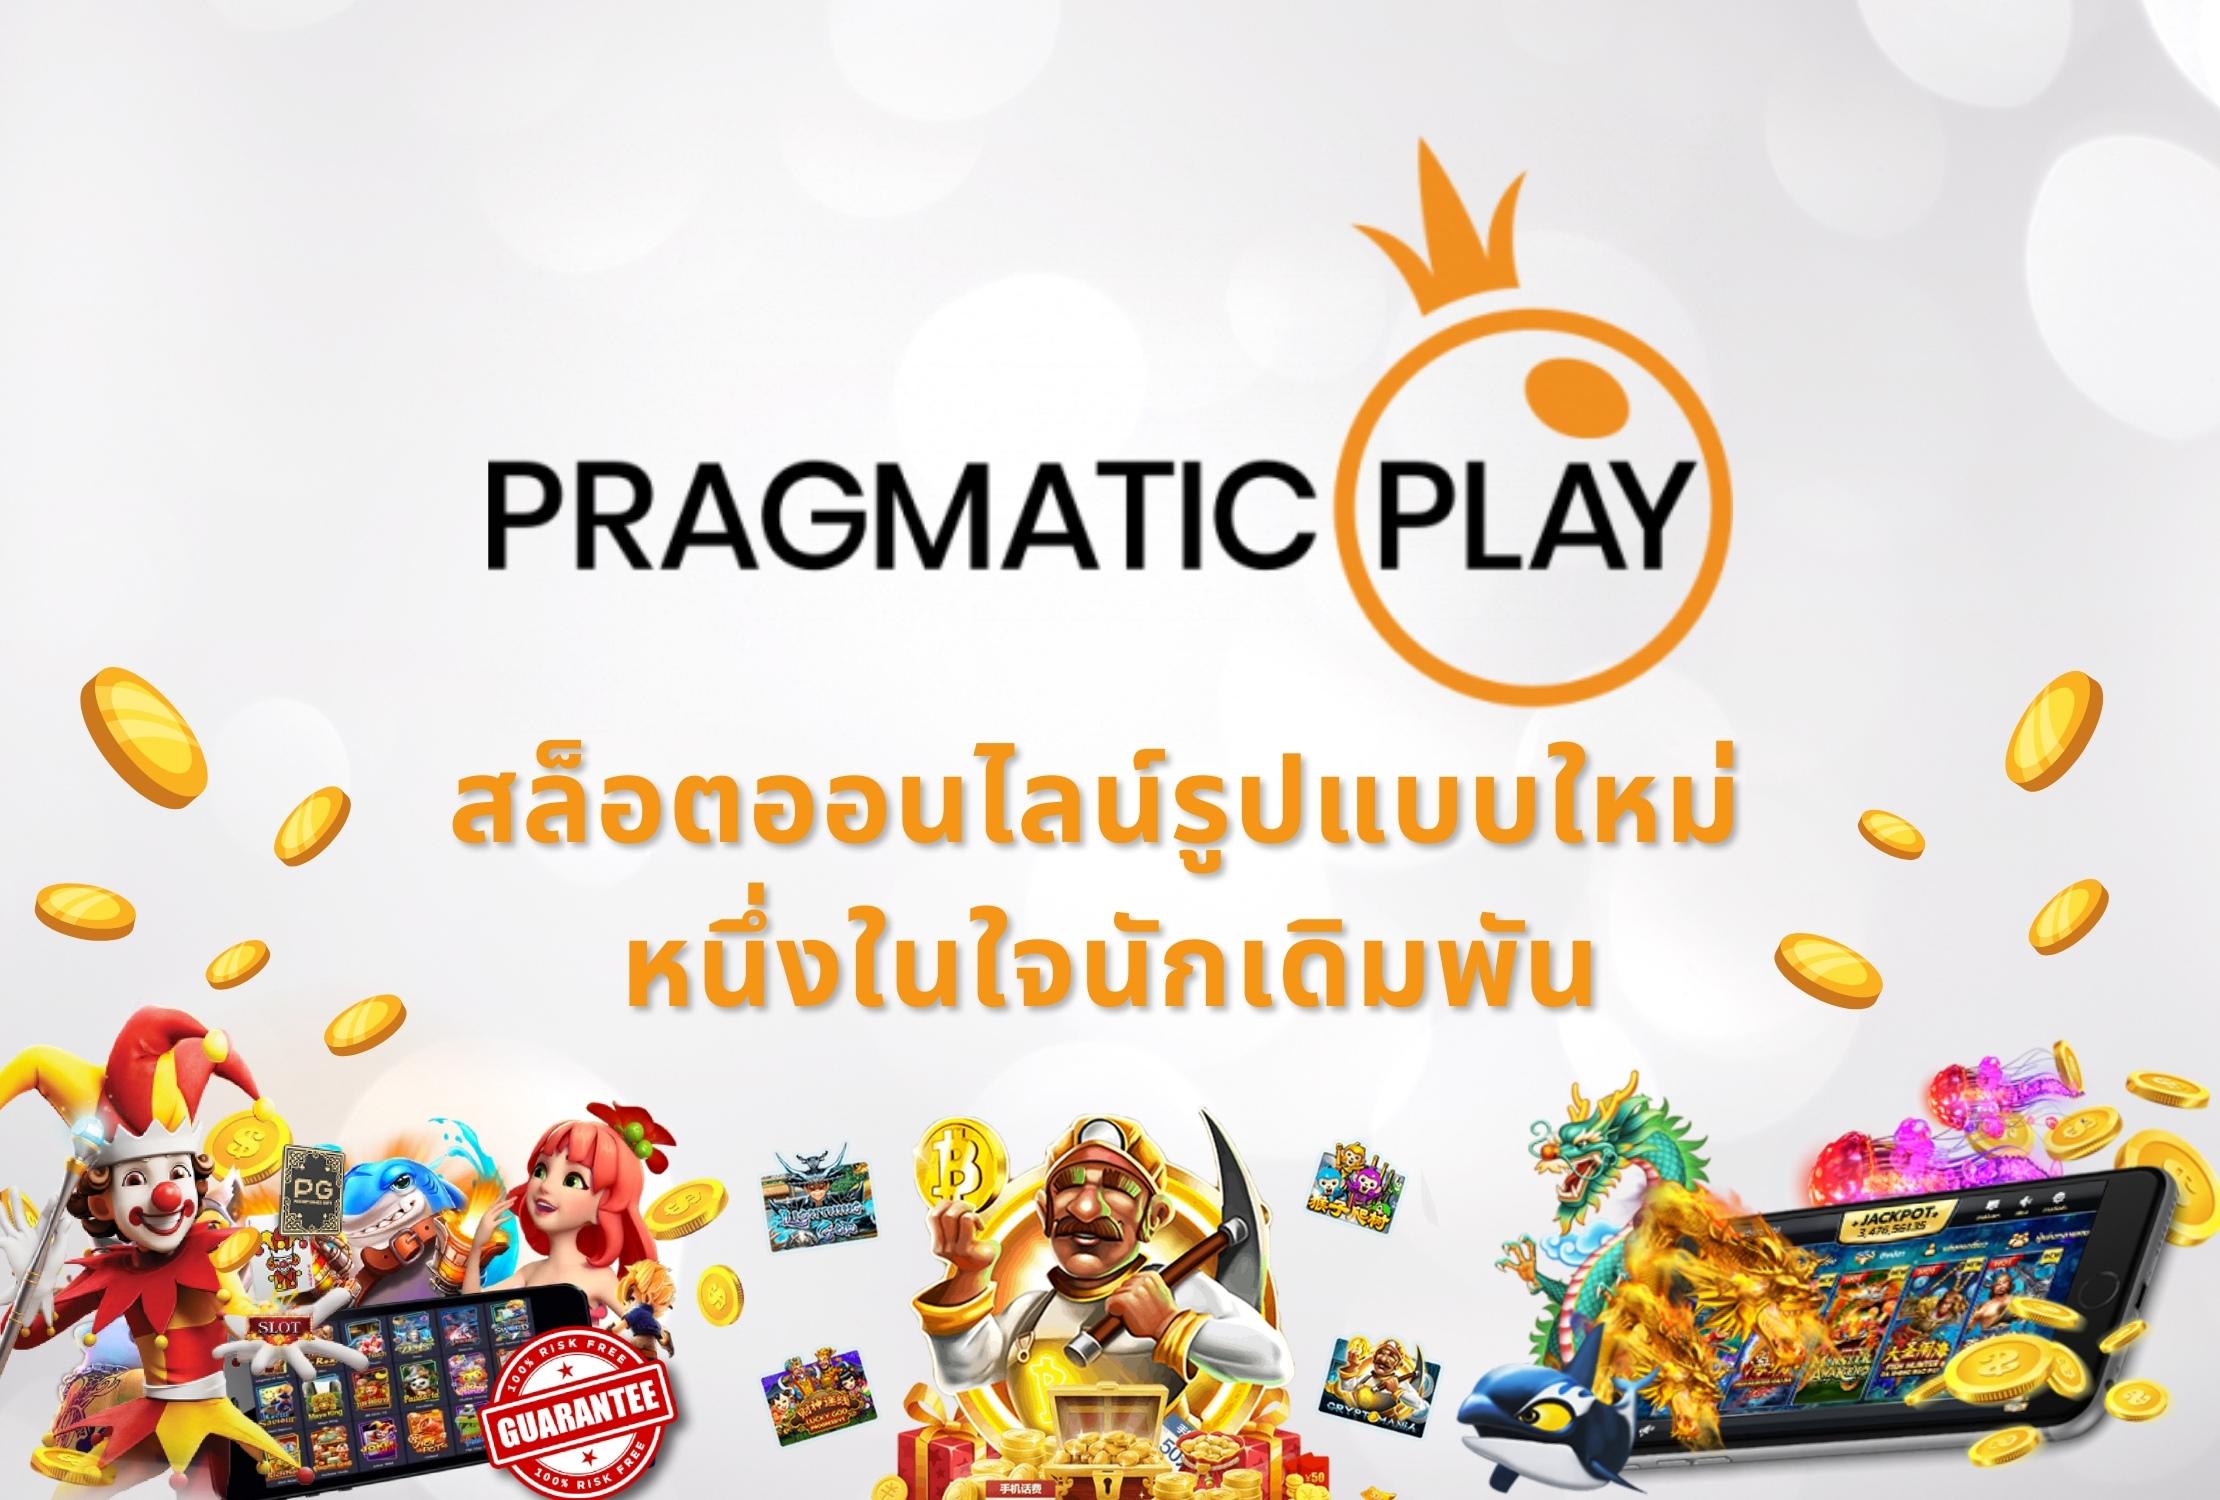 Pragmatic Play สล็อตออนไลน์รูปแบบใหม่ หนึ่งในใจนักเดิมพัน